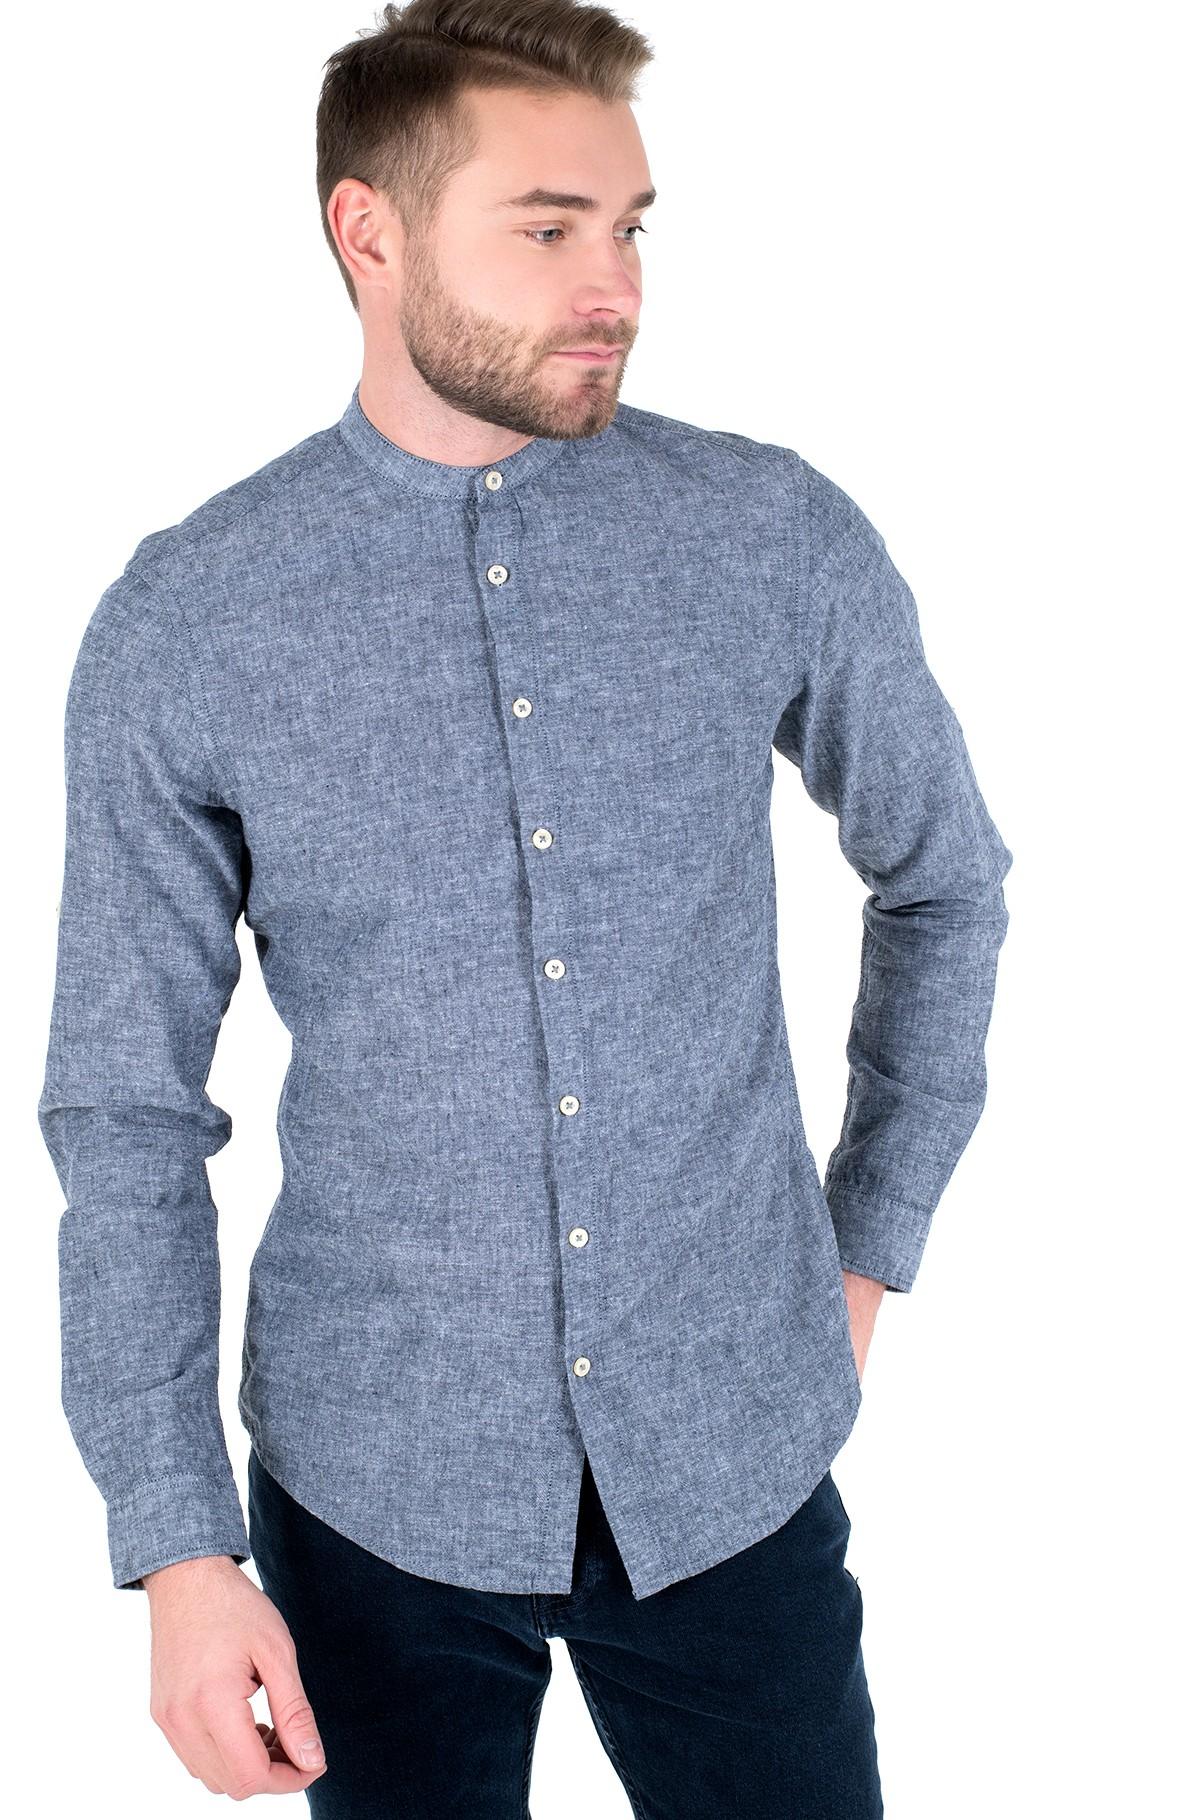 Marškiniai 409128/3S75-full-1